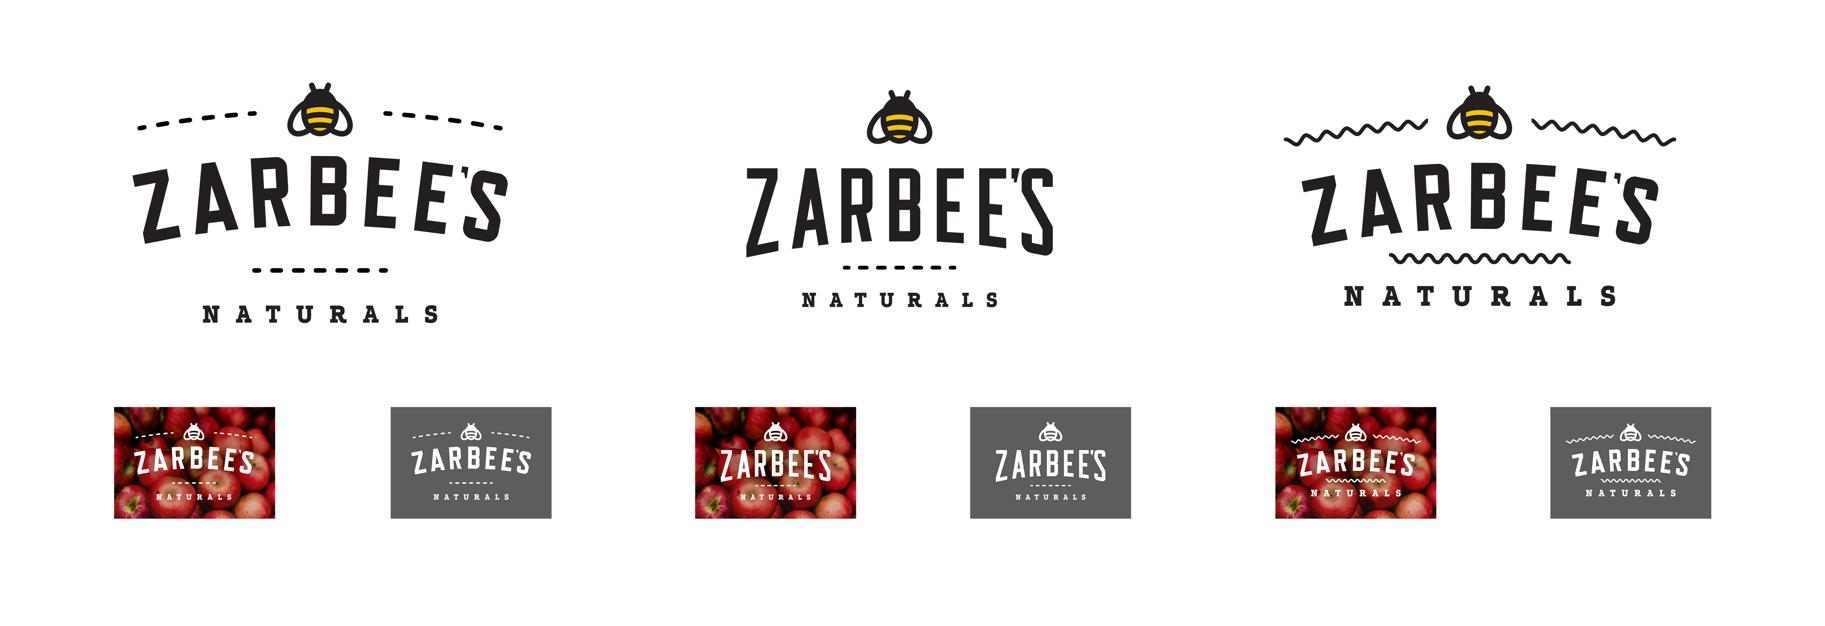 Zarbee's logo design options